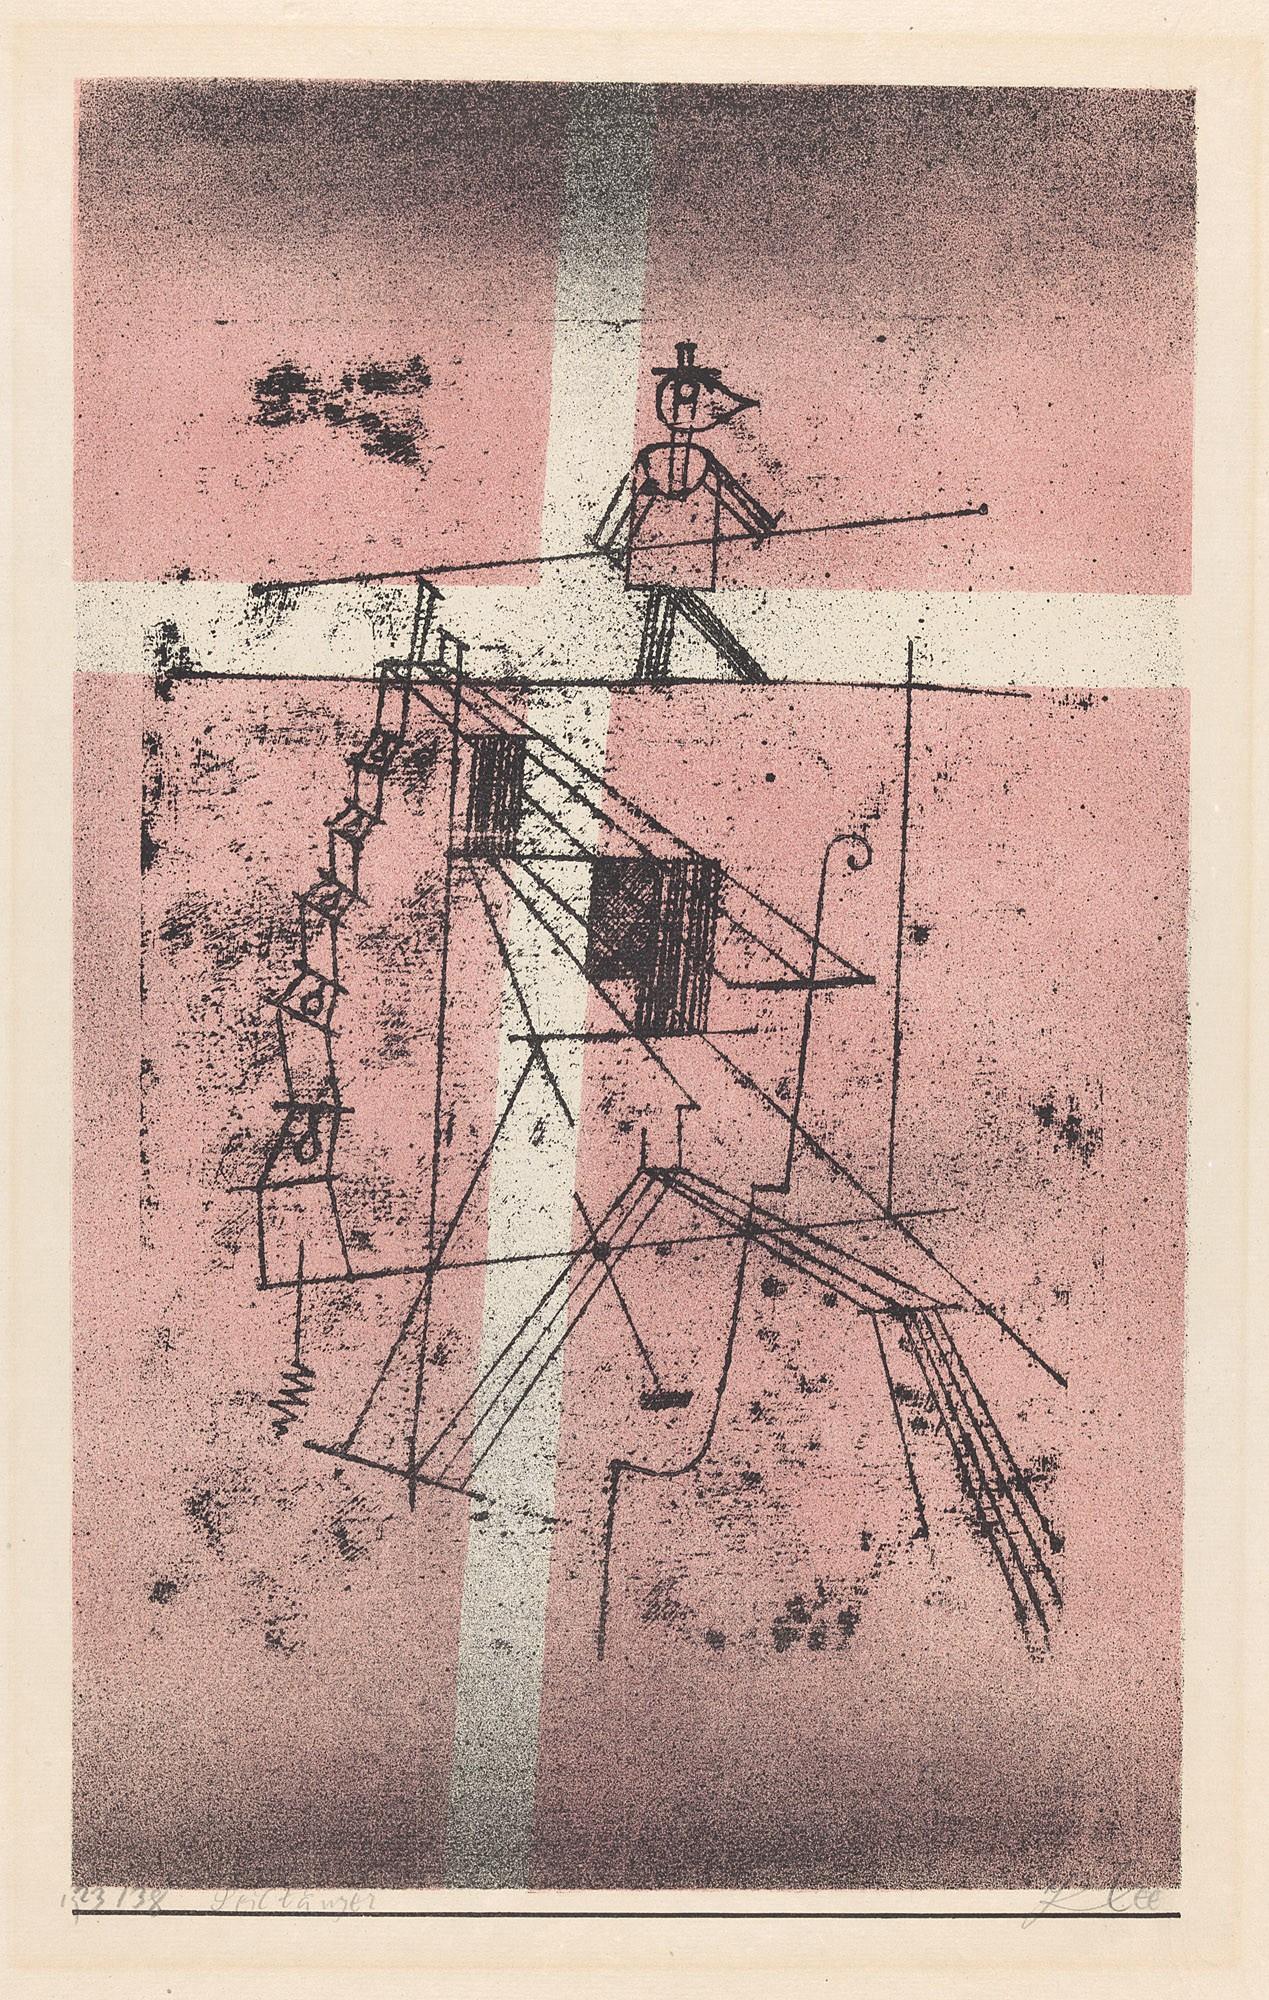 Paul Klee Le Funambule